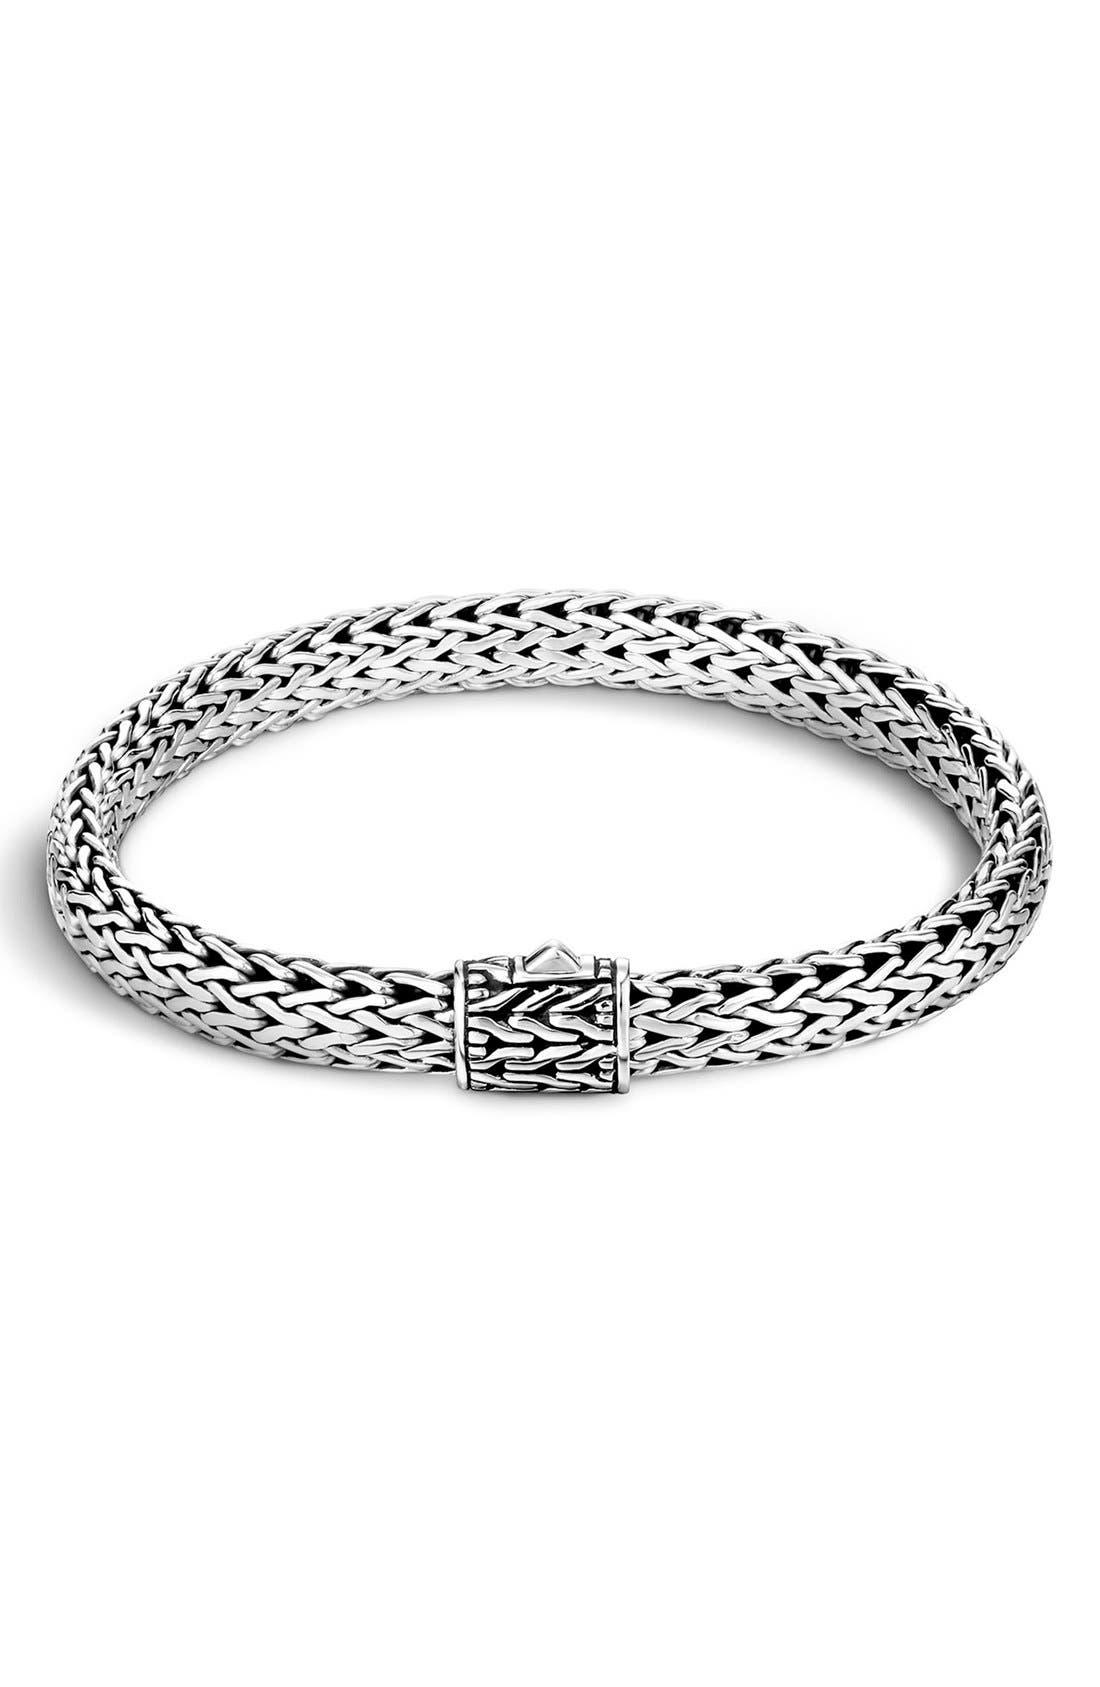 Main Image - John Hardy 'Classic Chain' Small Bracelet